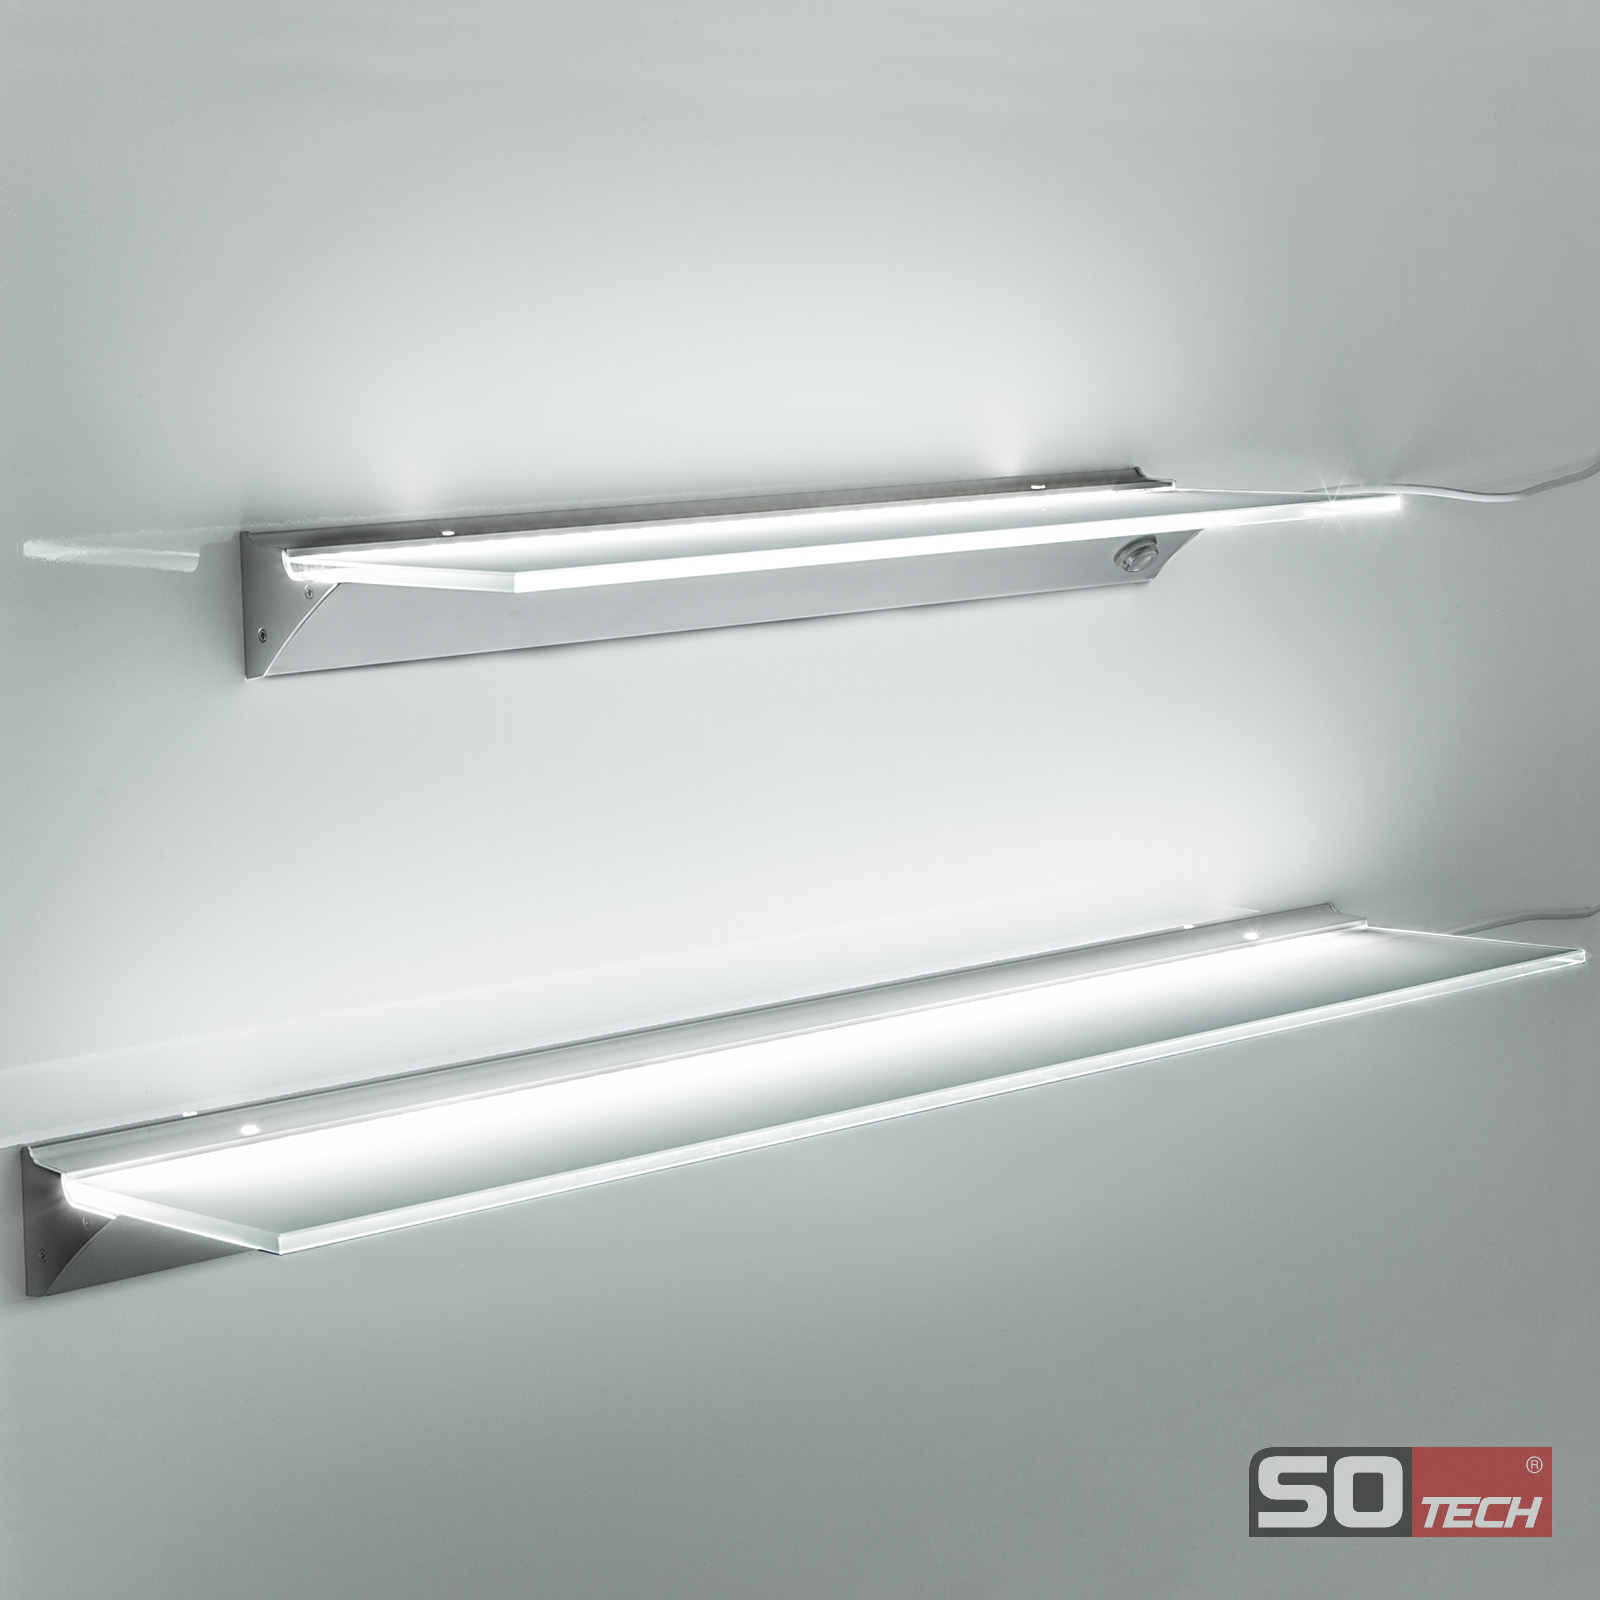 SO-TECH SOTECH LED Leuchtregal SARA Glasregal Glasbodenleuchte JOICE ...